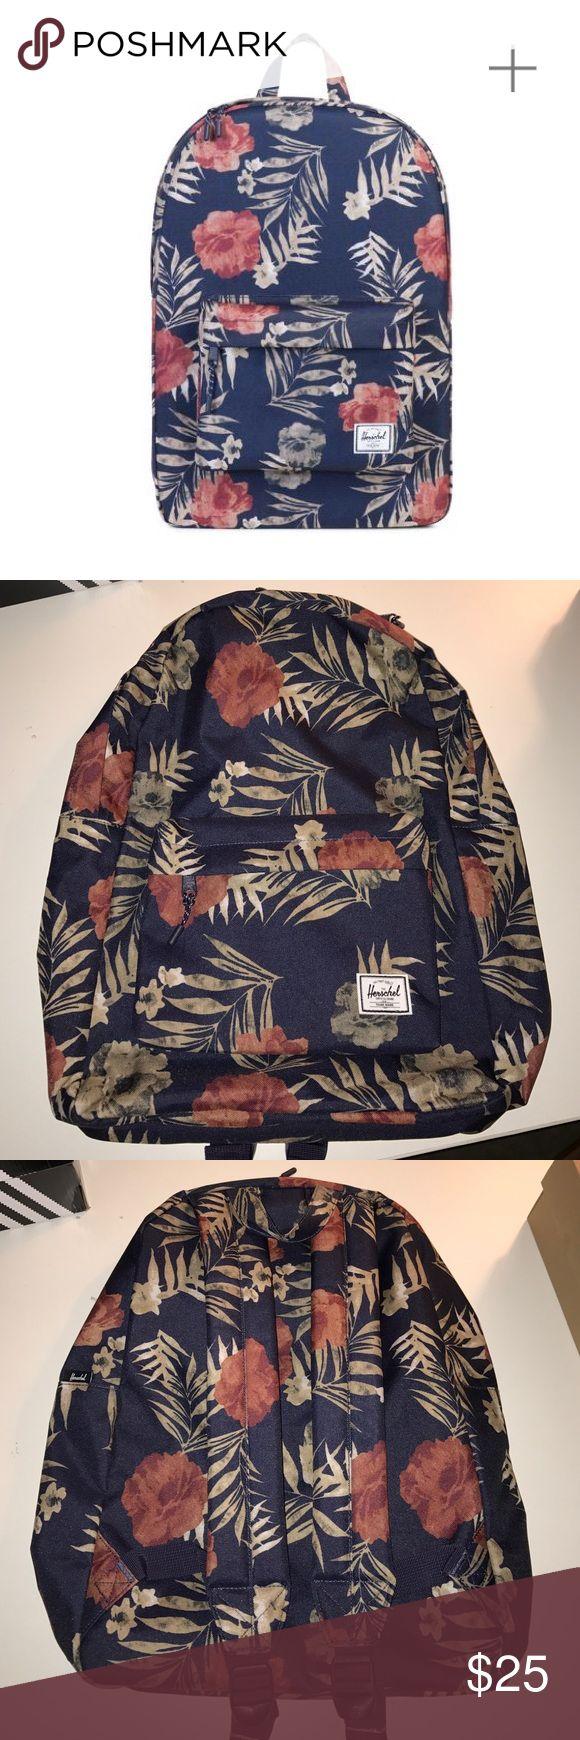 Herschel Classic backpack, Hawaiian floral print Brand: Herschel. Classic backpack with Hawaiian Floral print. Style#  10001-01342-OS. Never used Herschel Supply Company Bags Backpacks